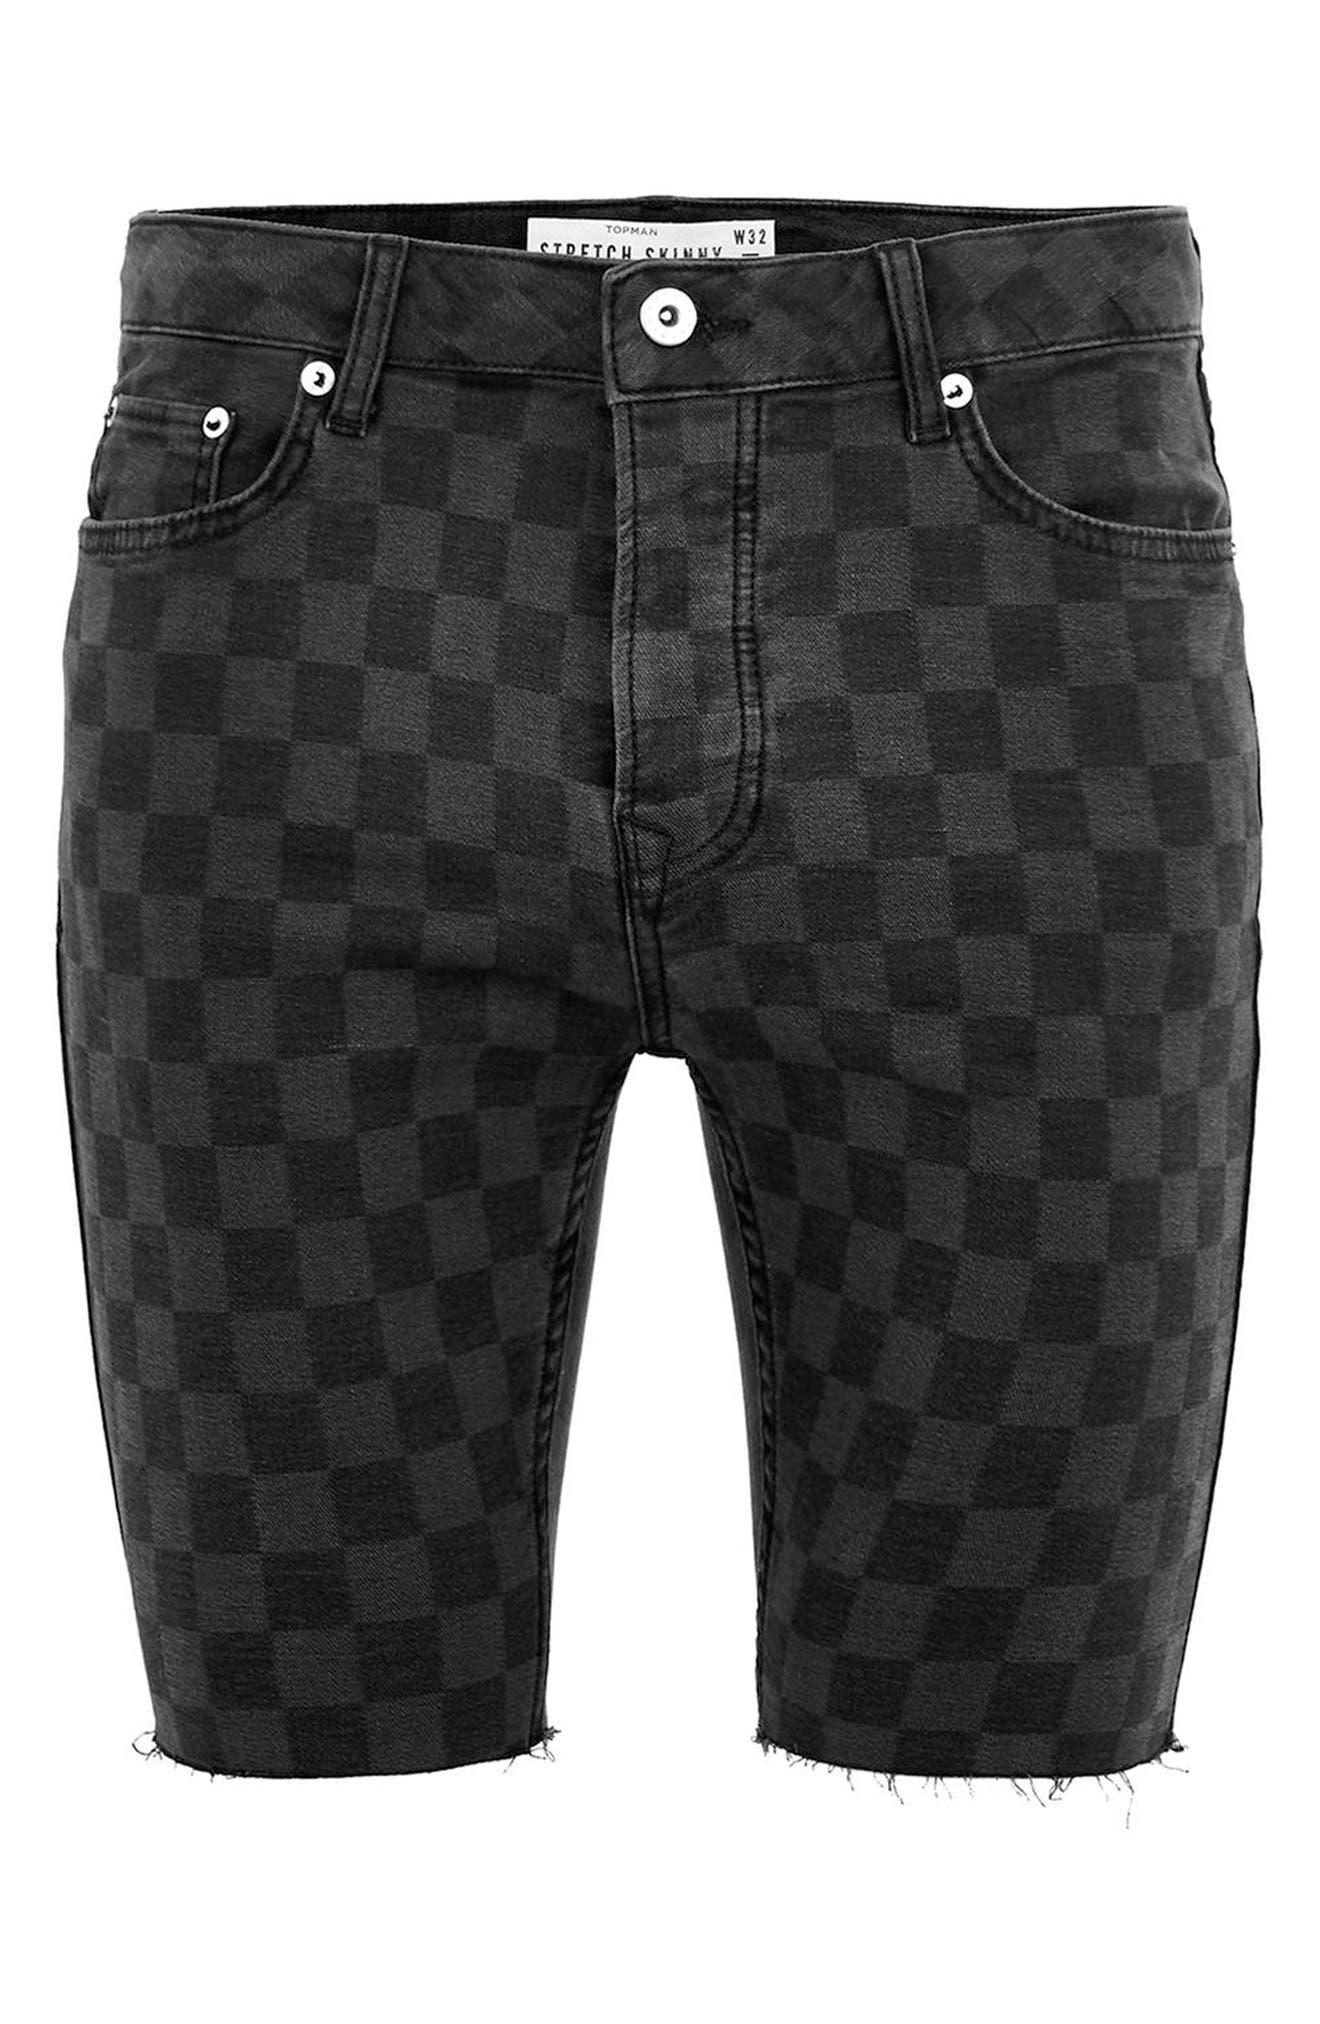 Stretch Skinny Fit Check Denim Shorts,                             Alternate thumbnail 4, color,                             Black